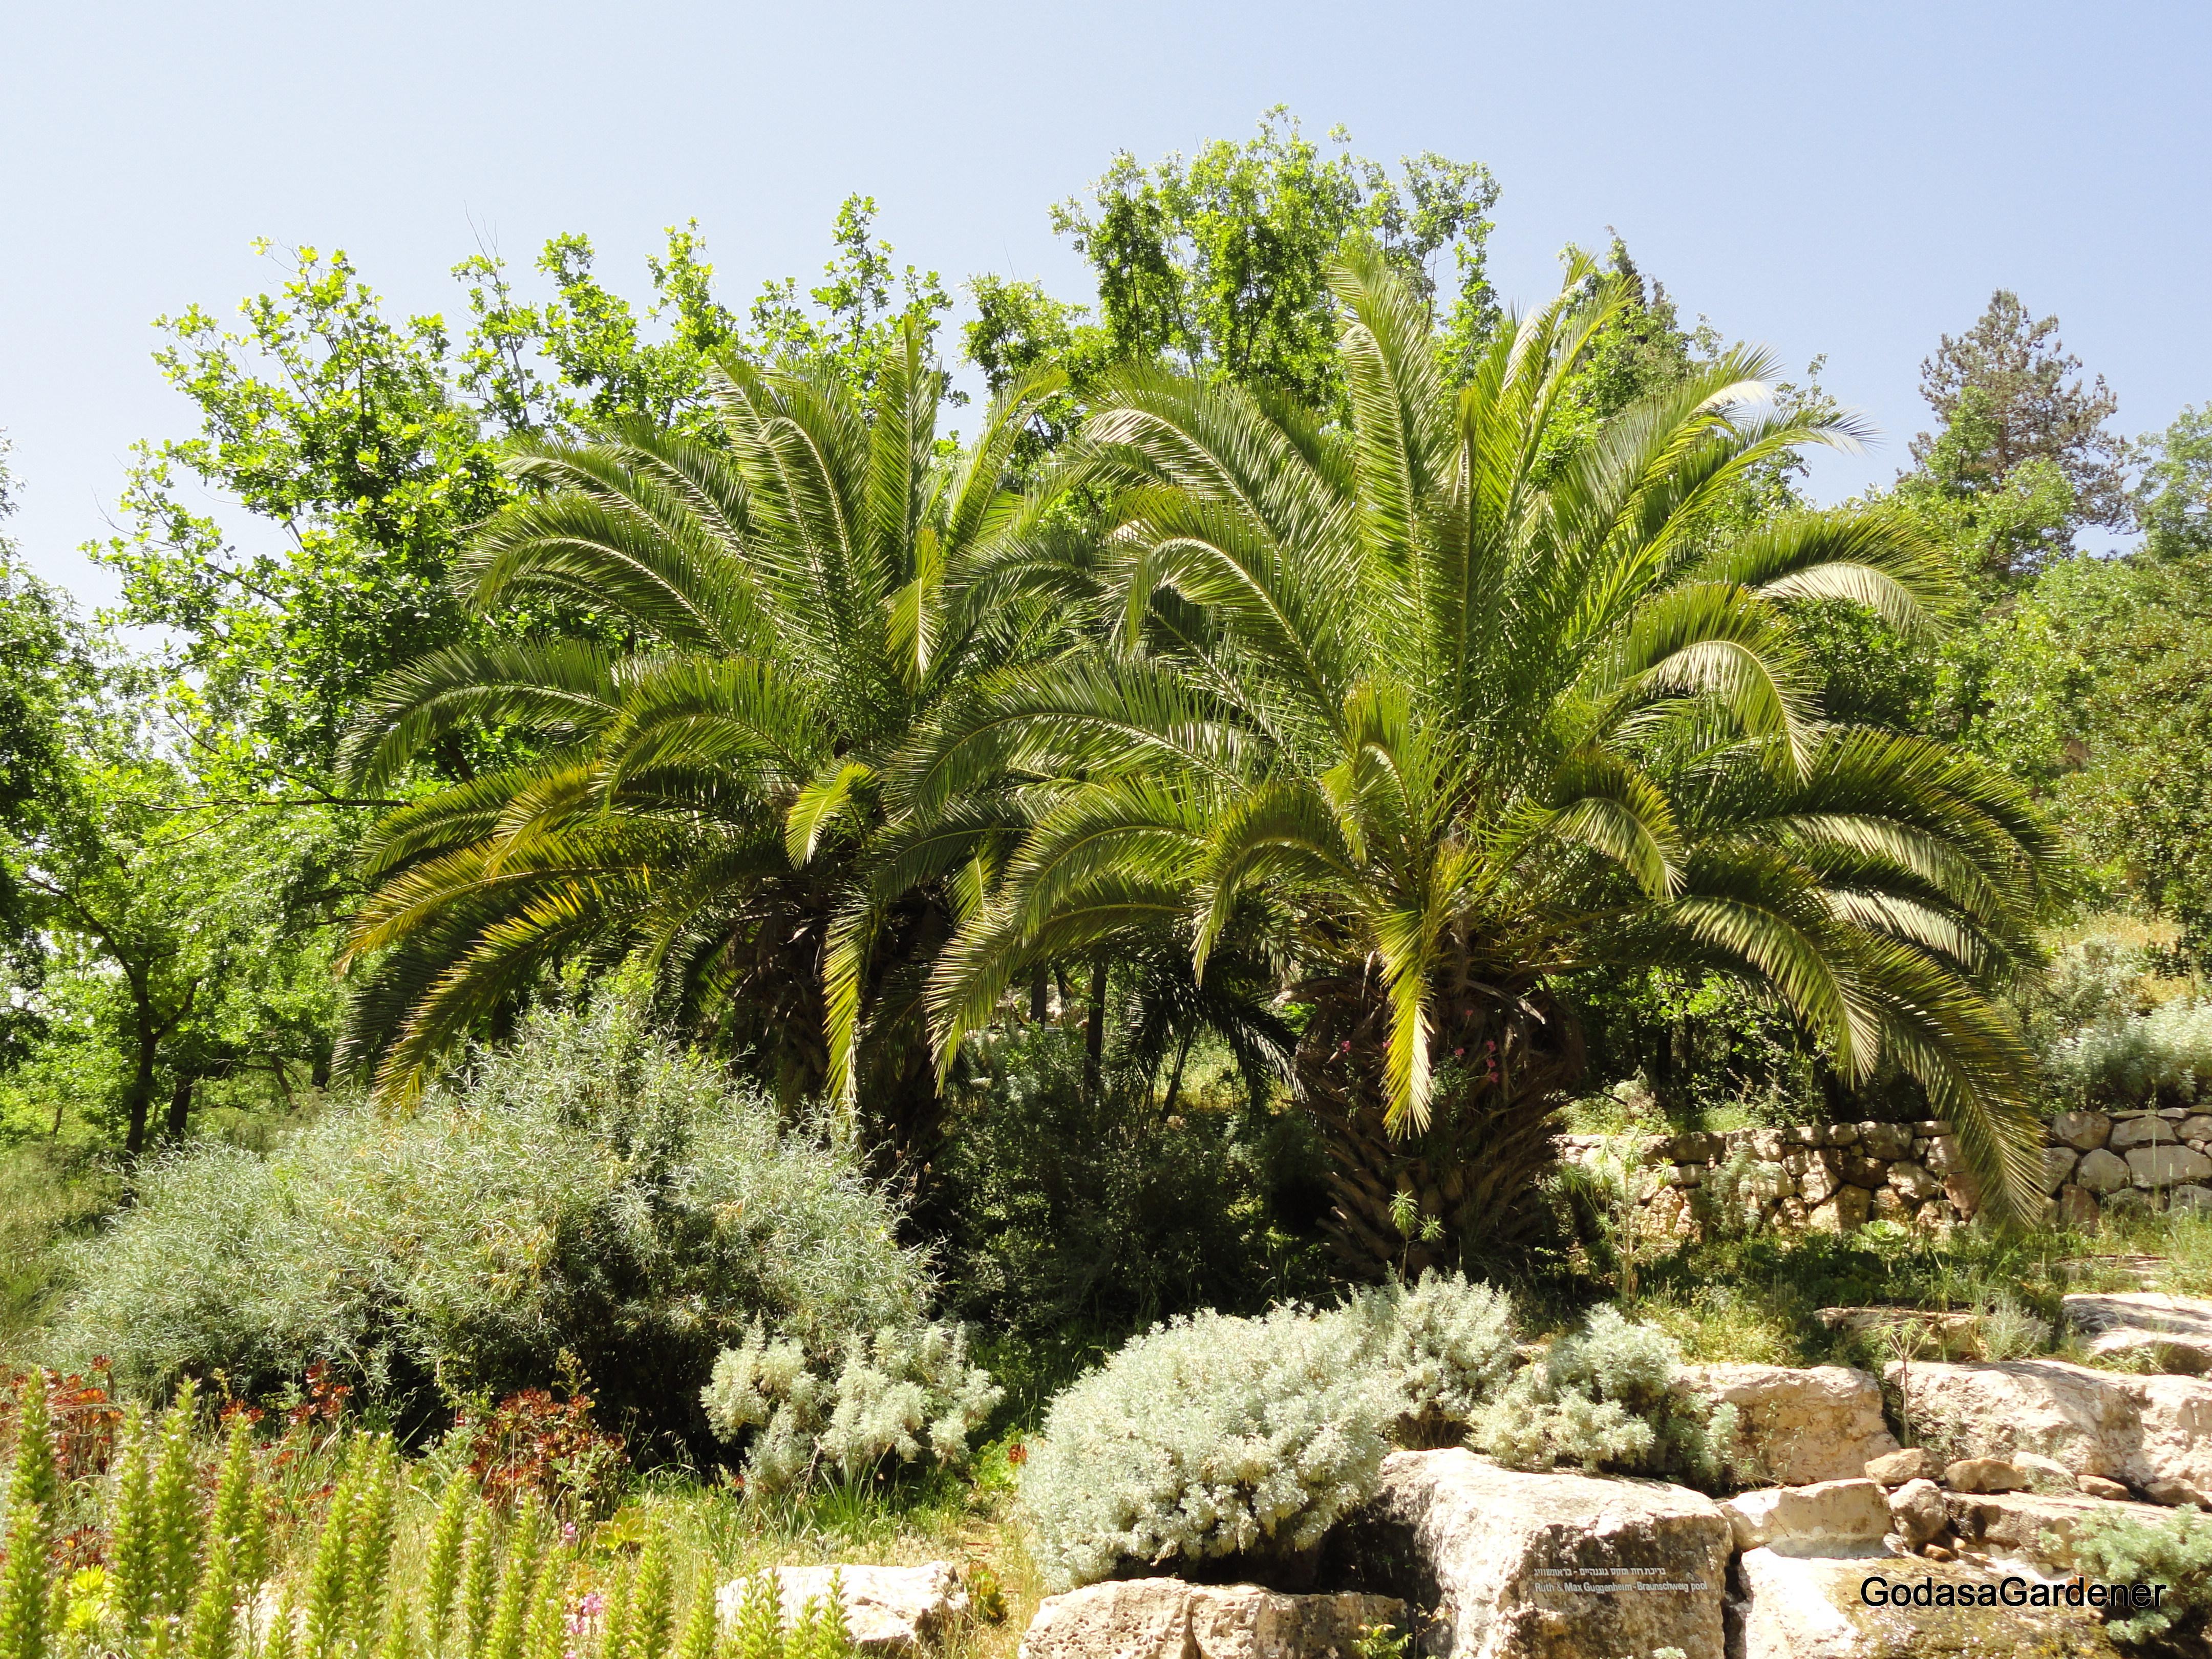 Deborah & the Palm Tree   God as a Gardener